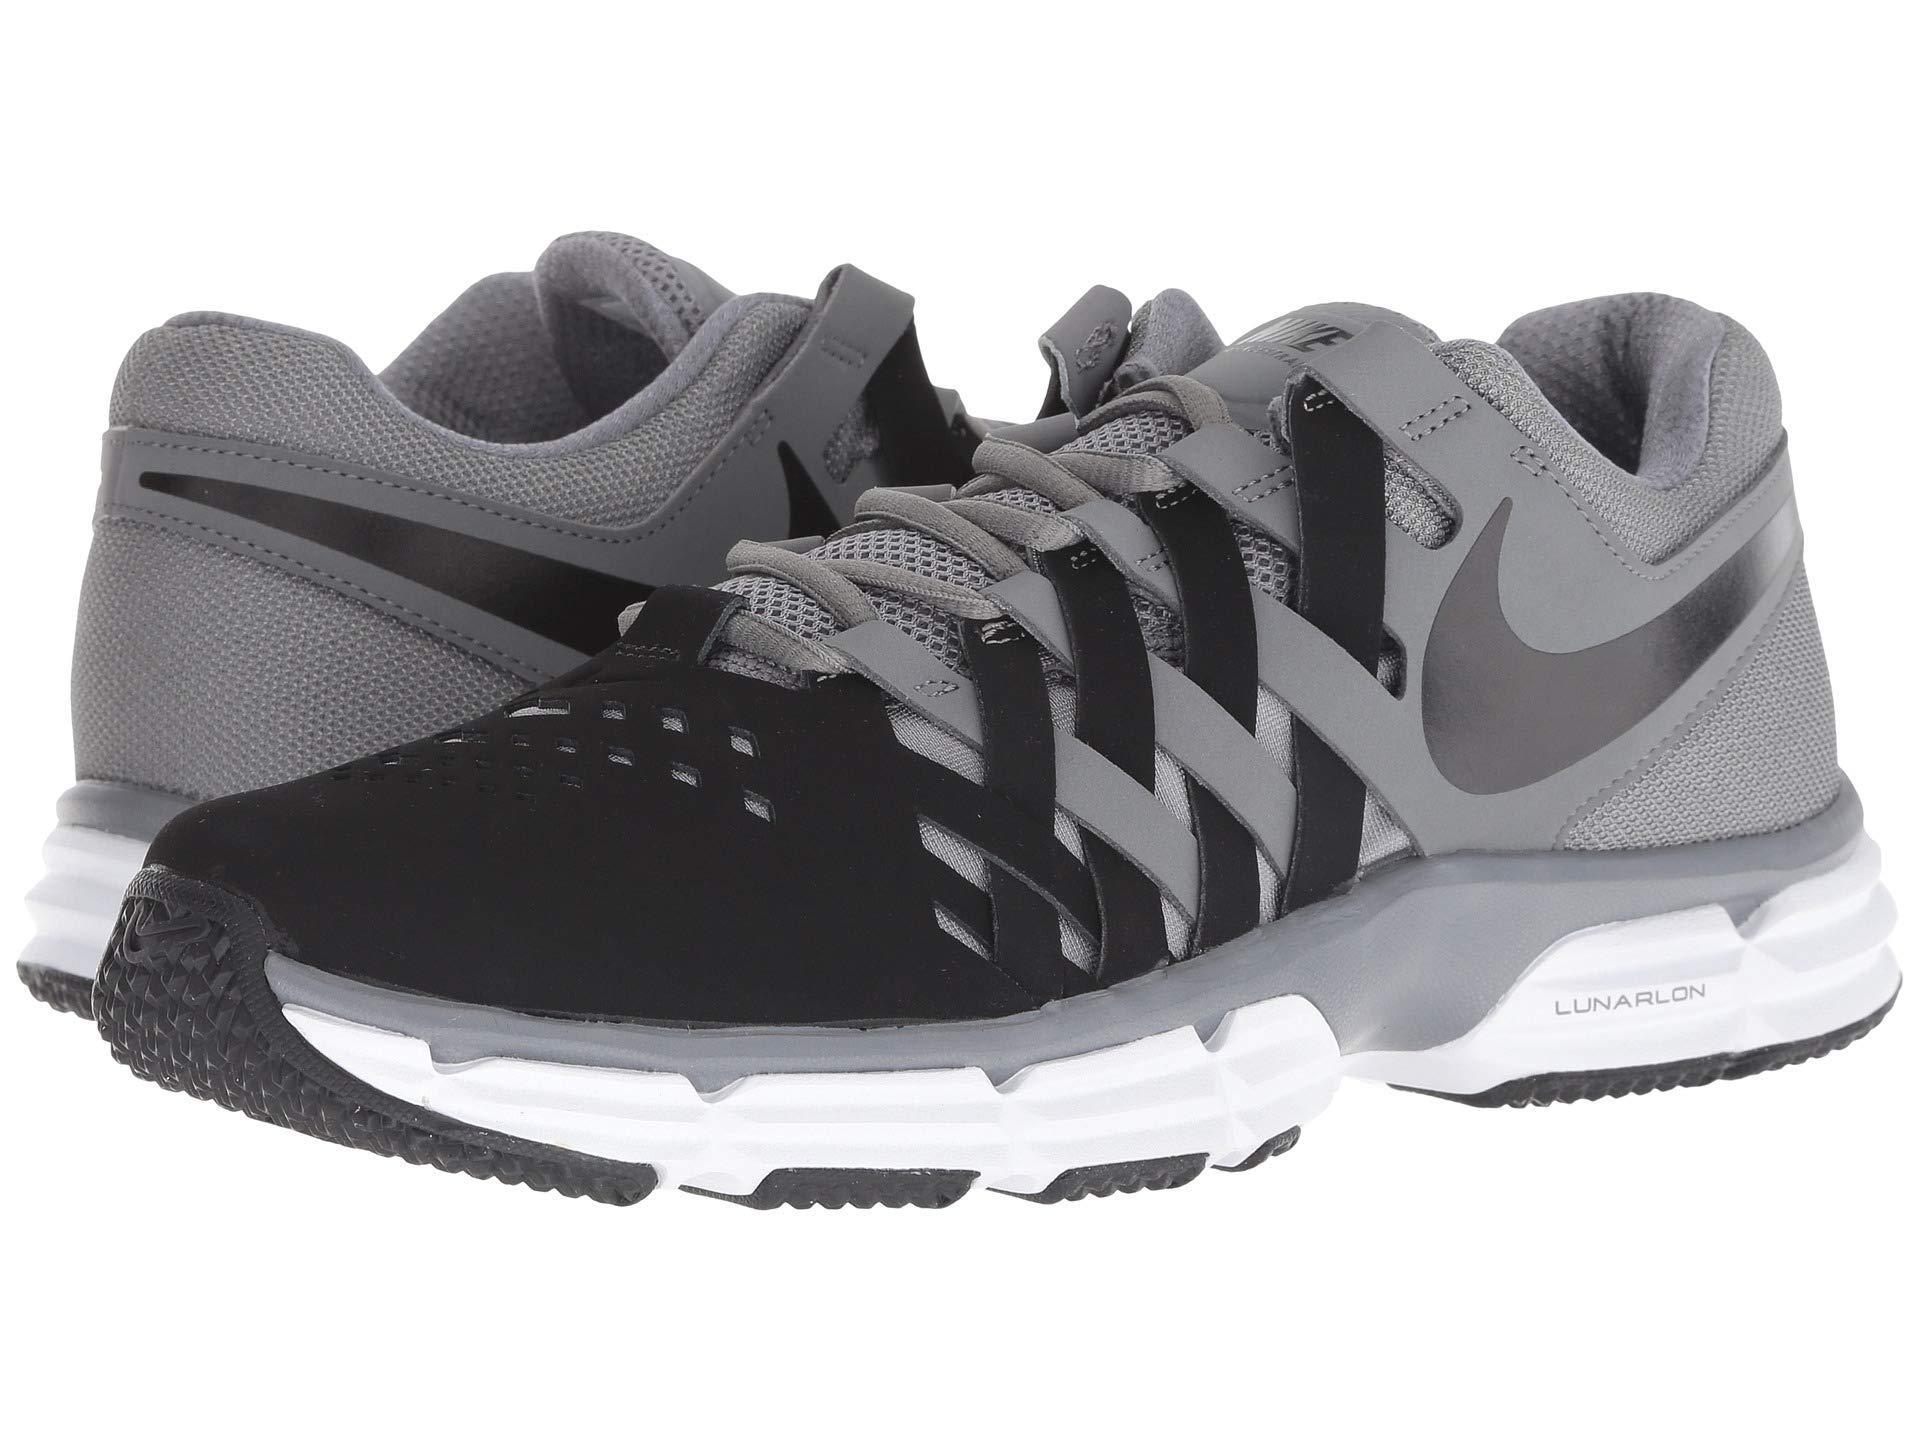 d899668b04 Nike Lunar Fingertrap Tr (black/gym Red 1) Men's Shoes in Gray for ...